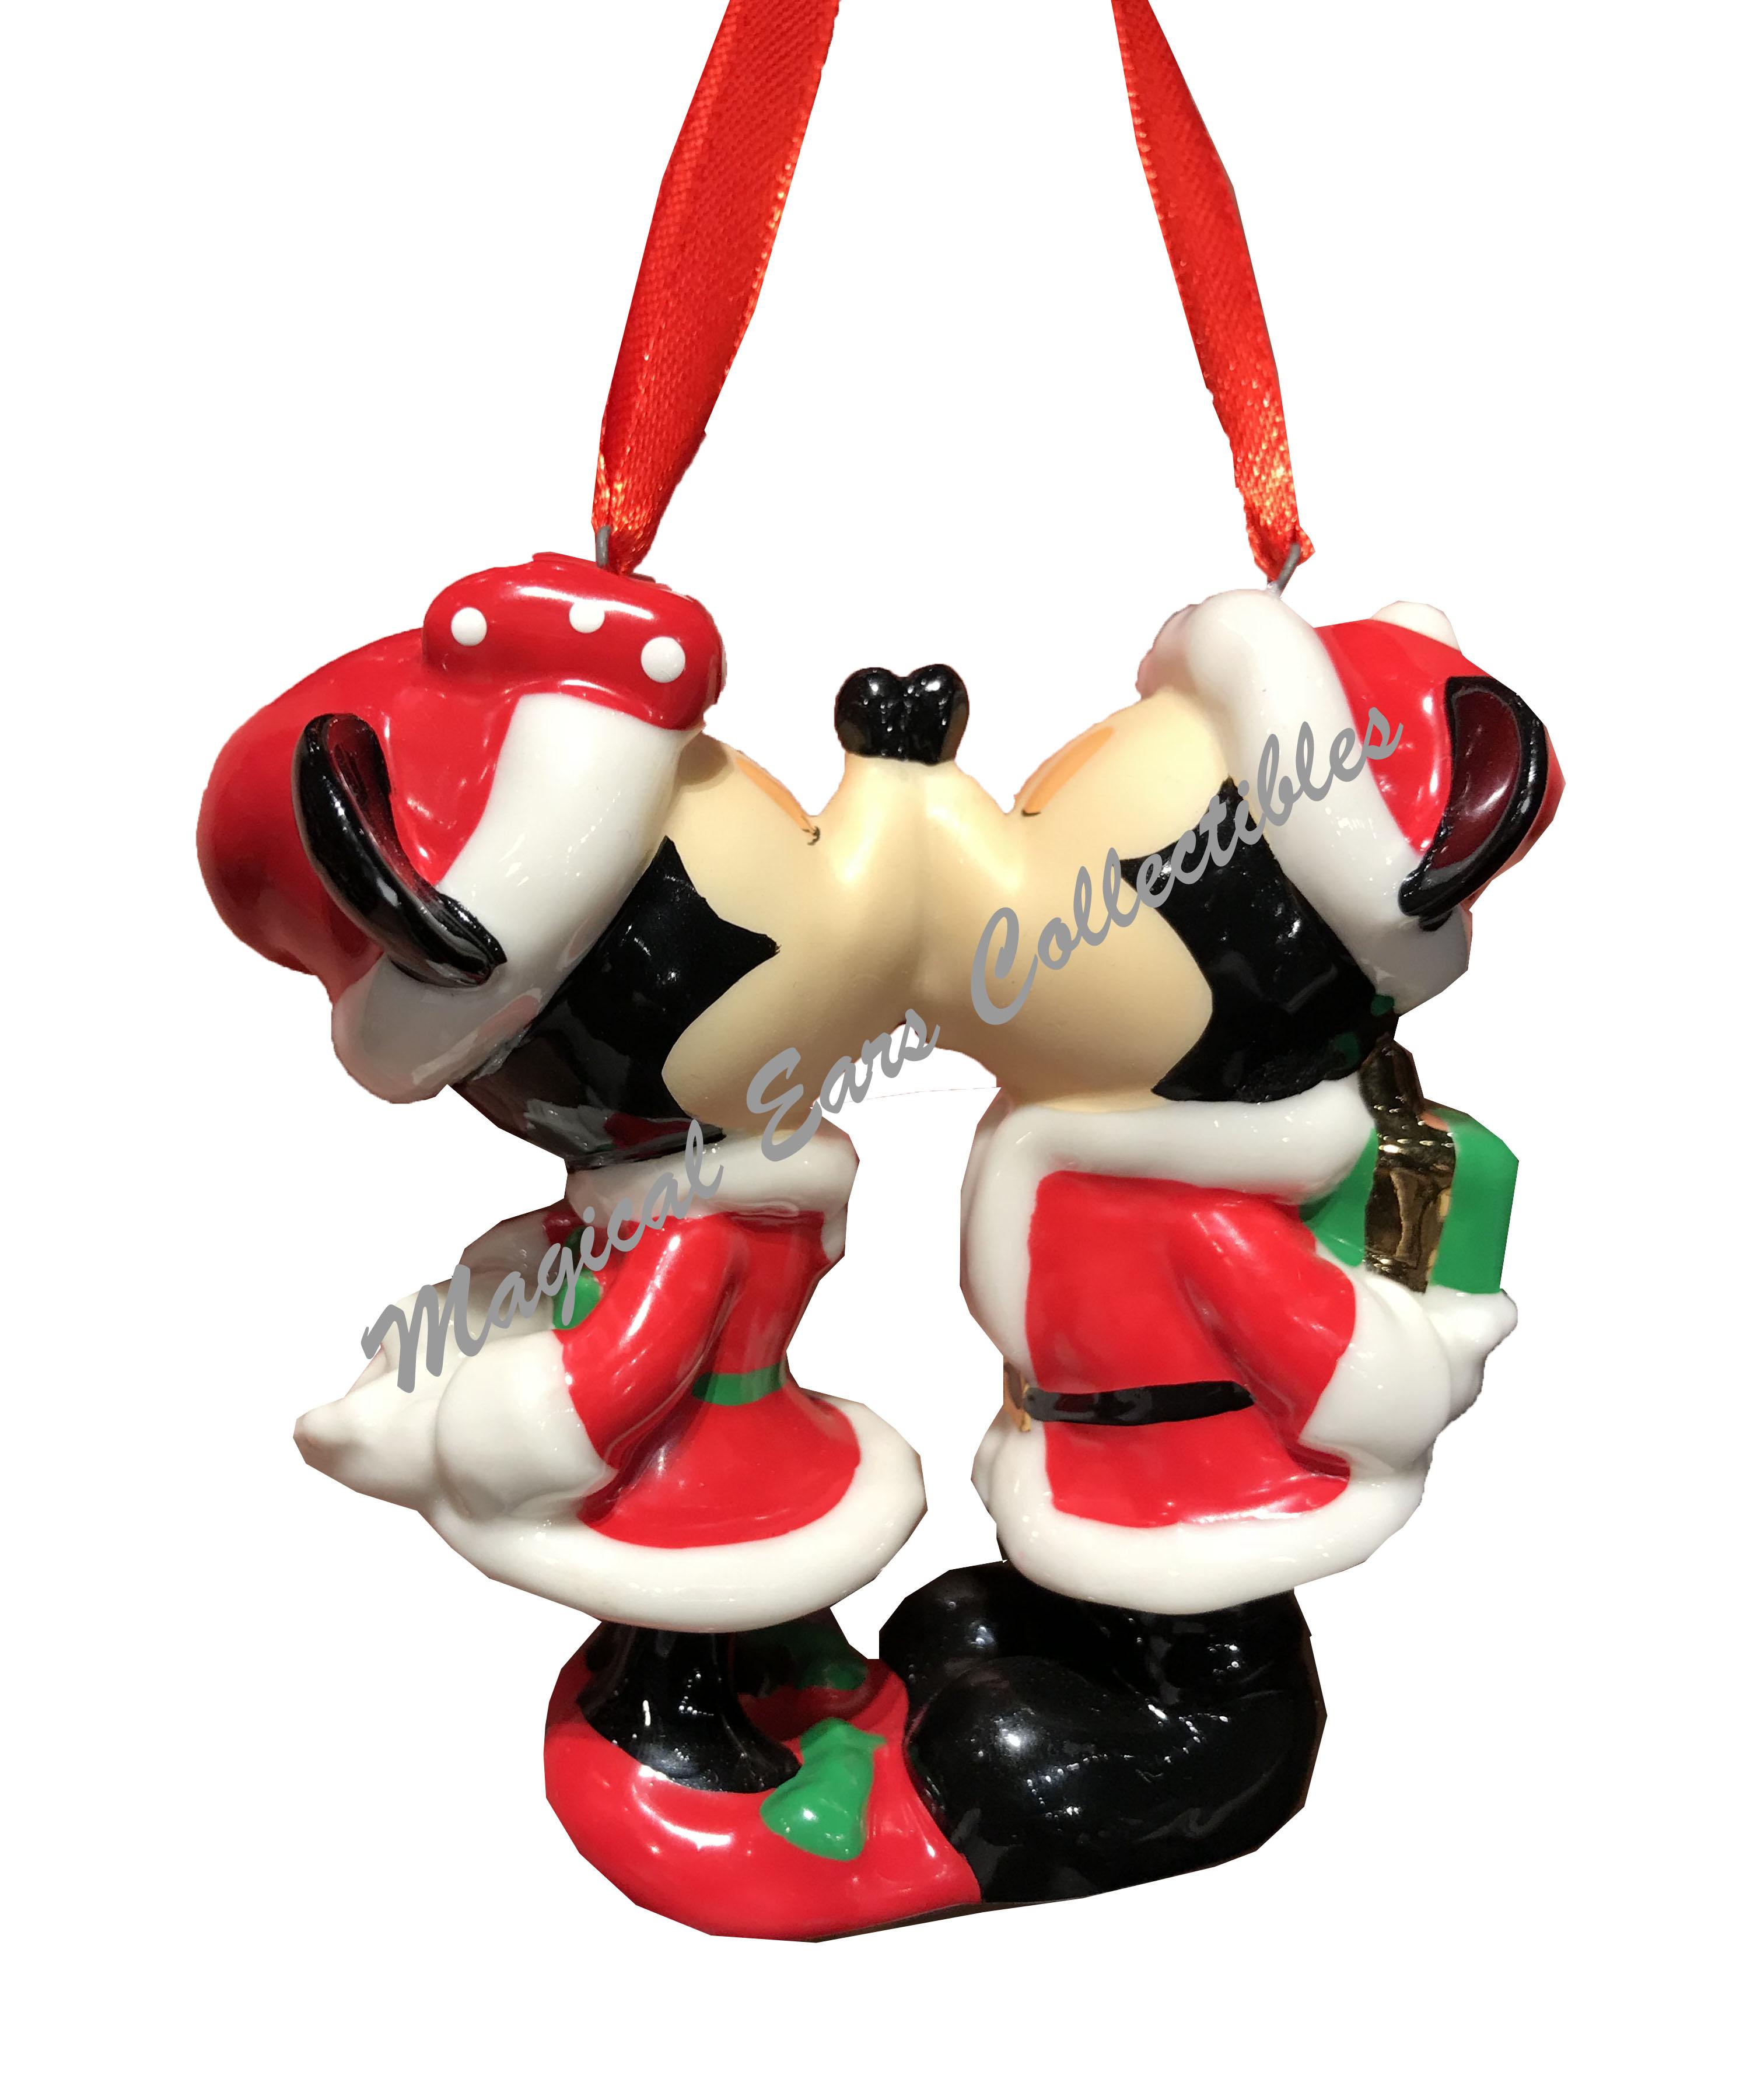 Disney Christmas Ornament - Santa Mickey and Minnie Kiss